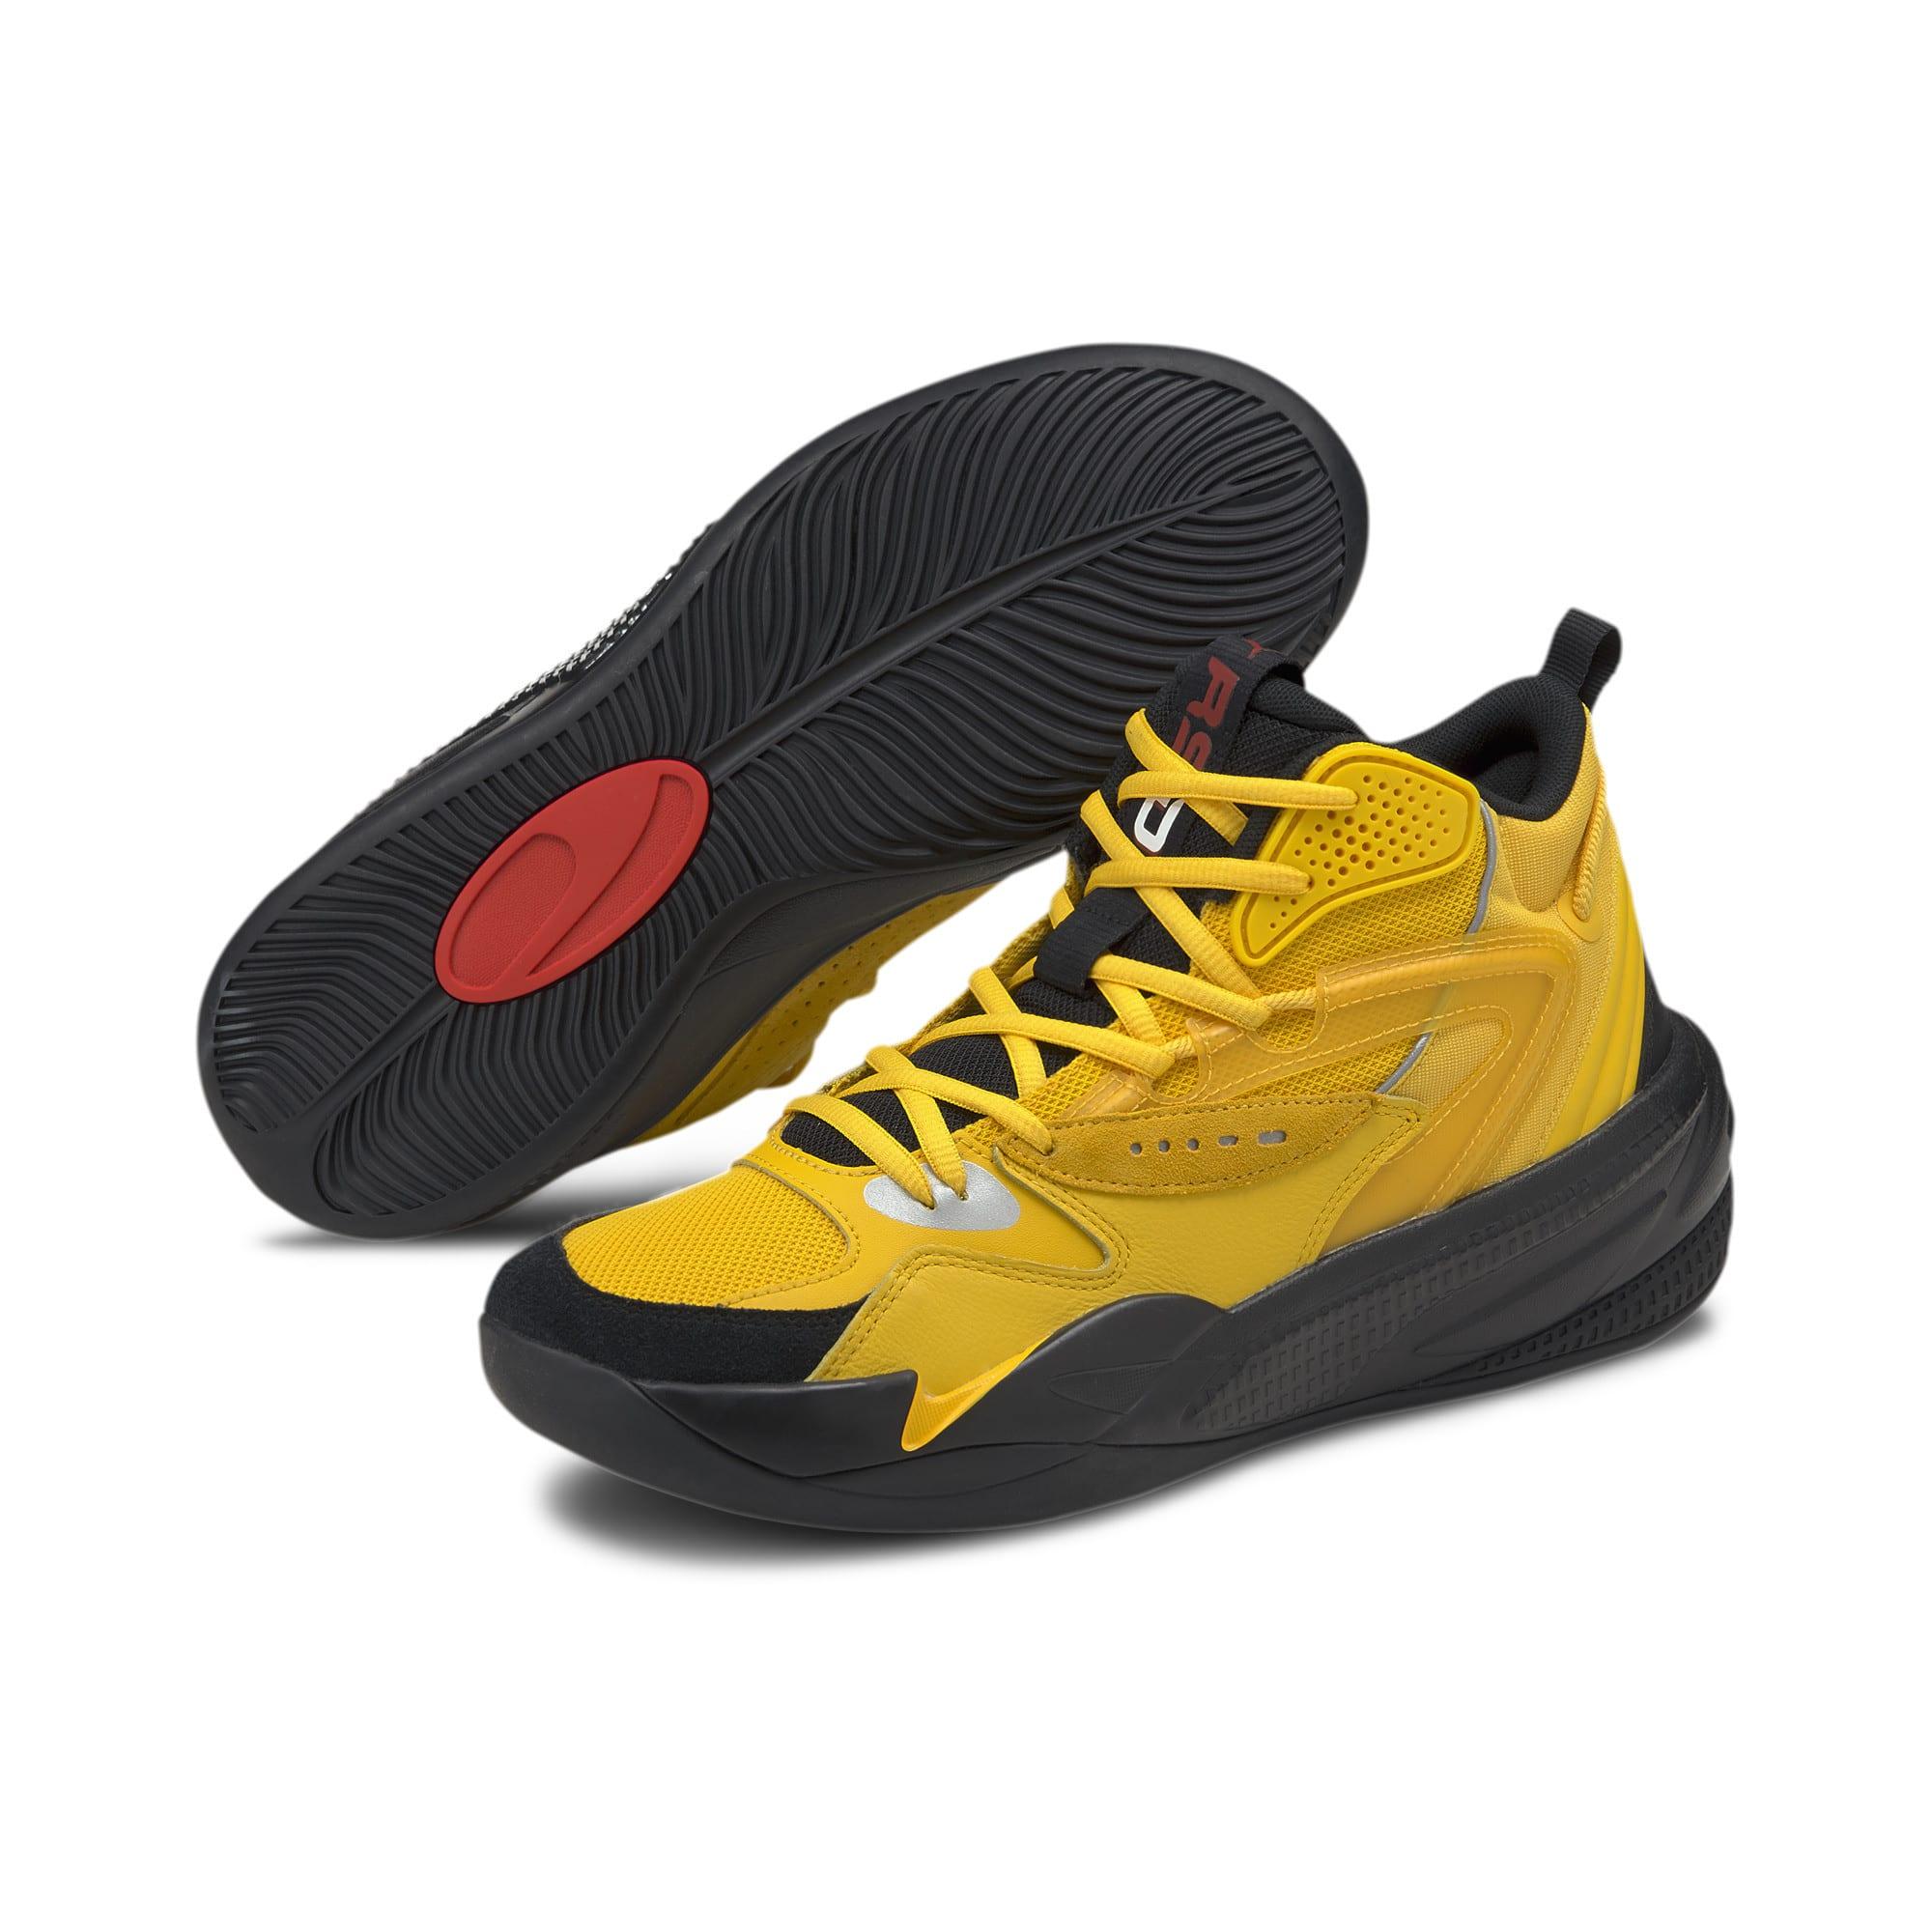 PUMA Releases J. Cole's Second Signature Basketball Shoe, The DREAMER 2